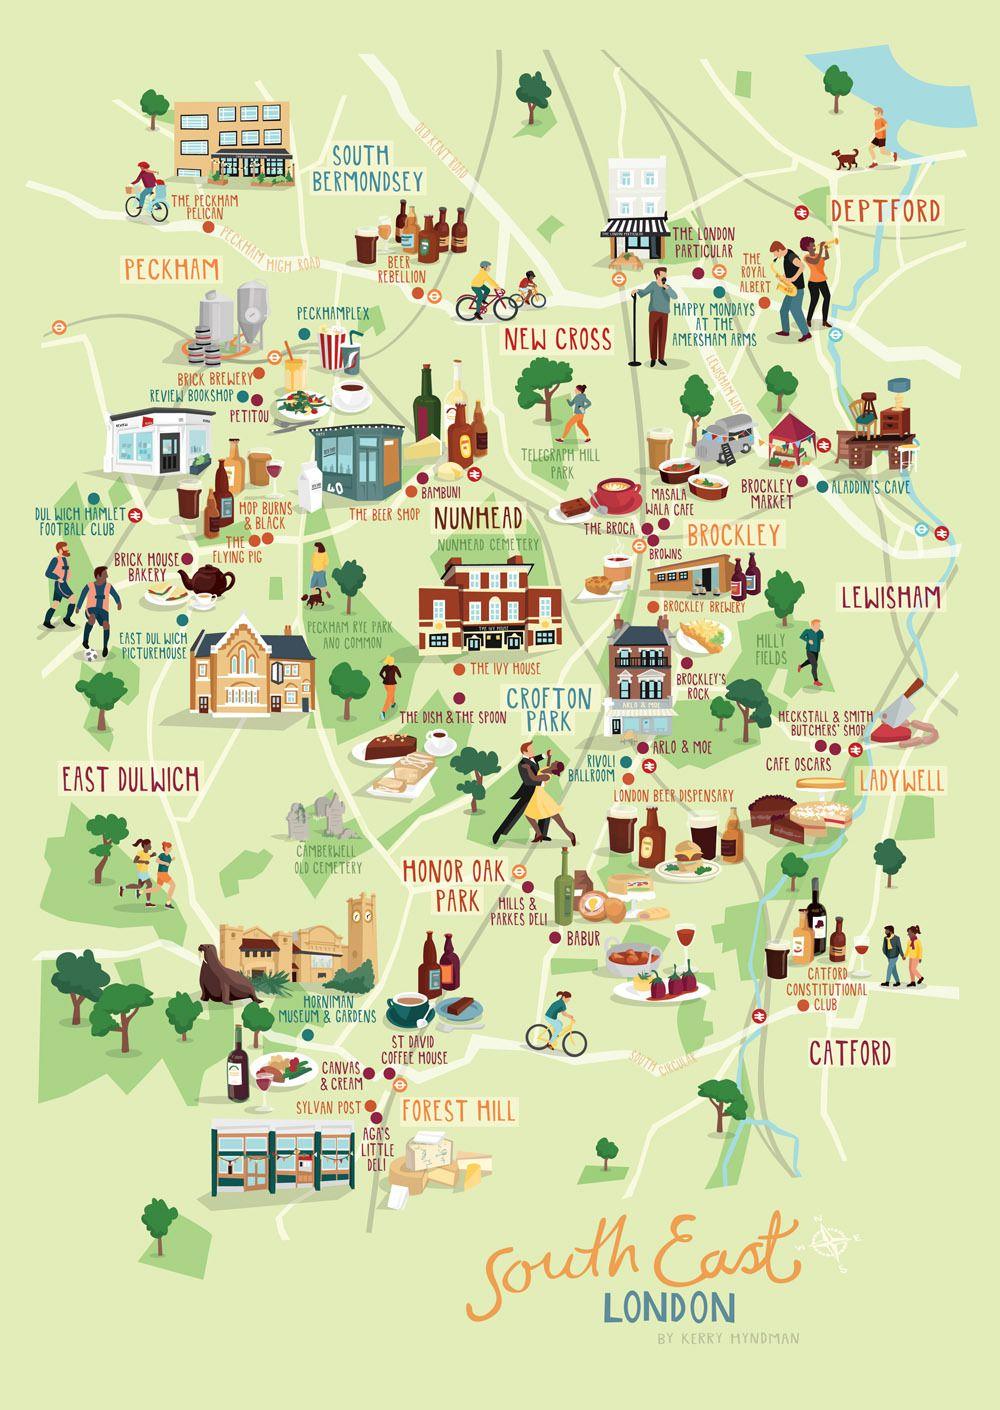 East London Uk Map.South East London Map Illustration Kerryhyndman Co Uk Maps In 2019